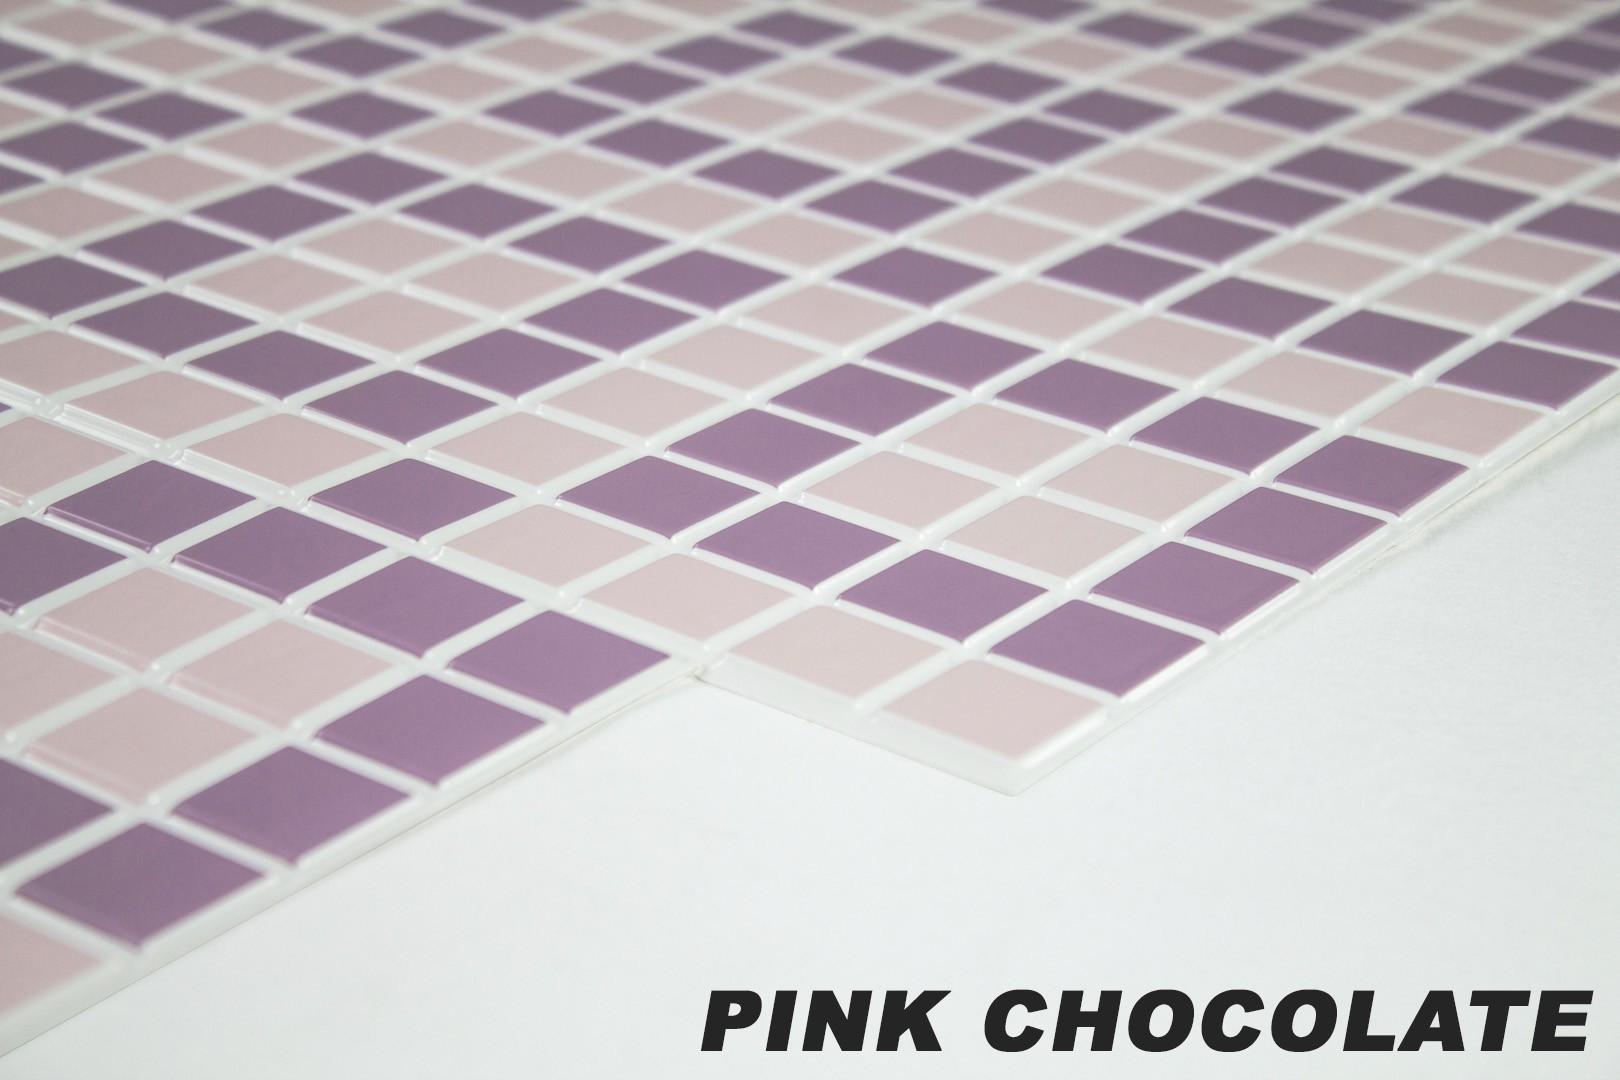 Pink chocolate originalbild 1